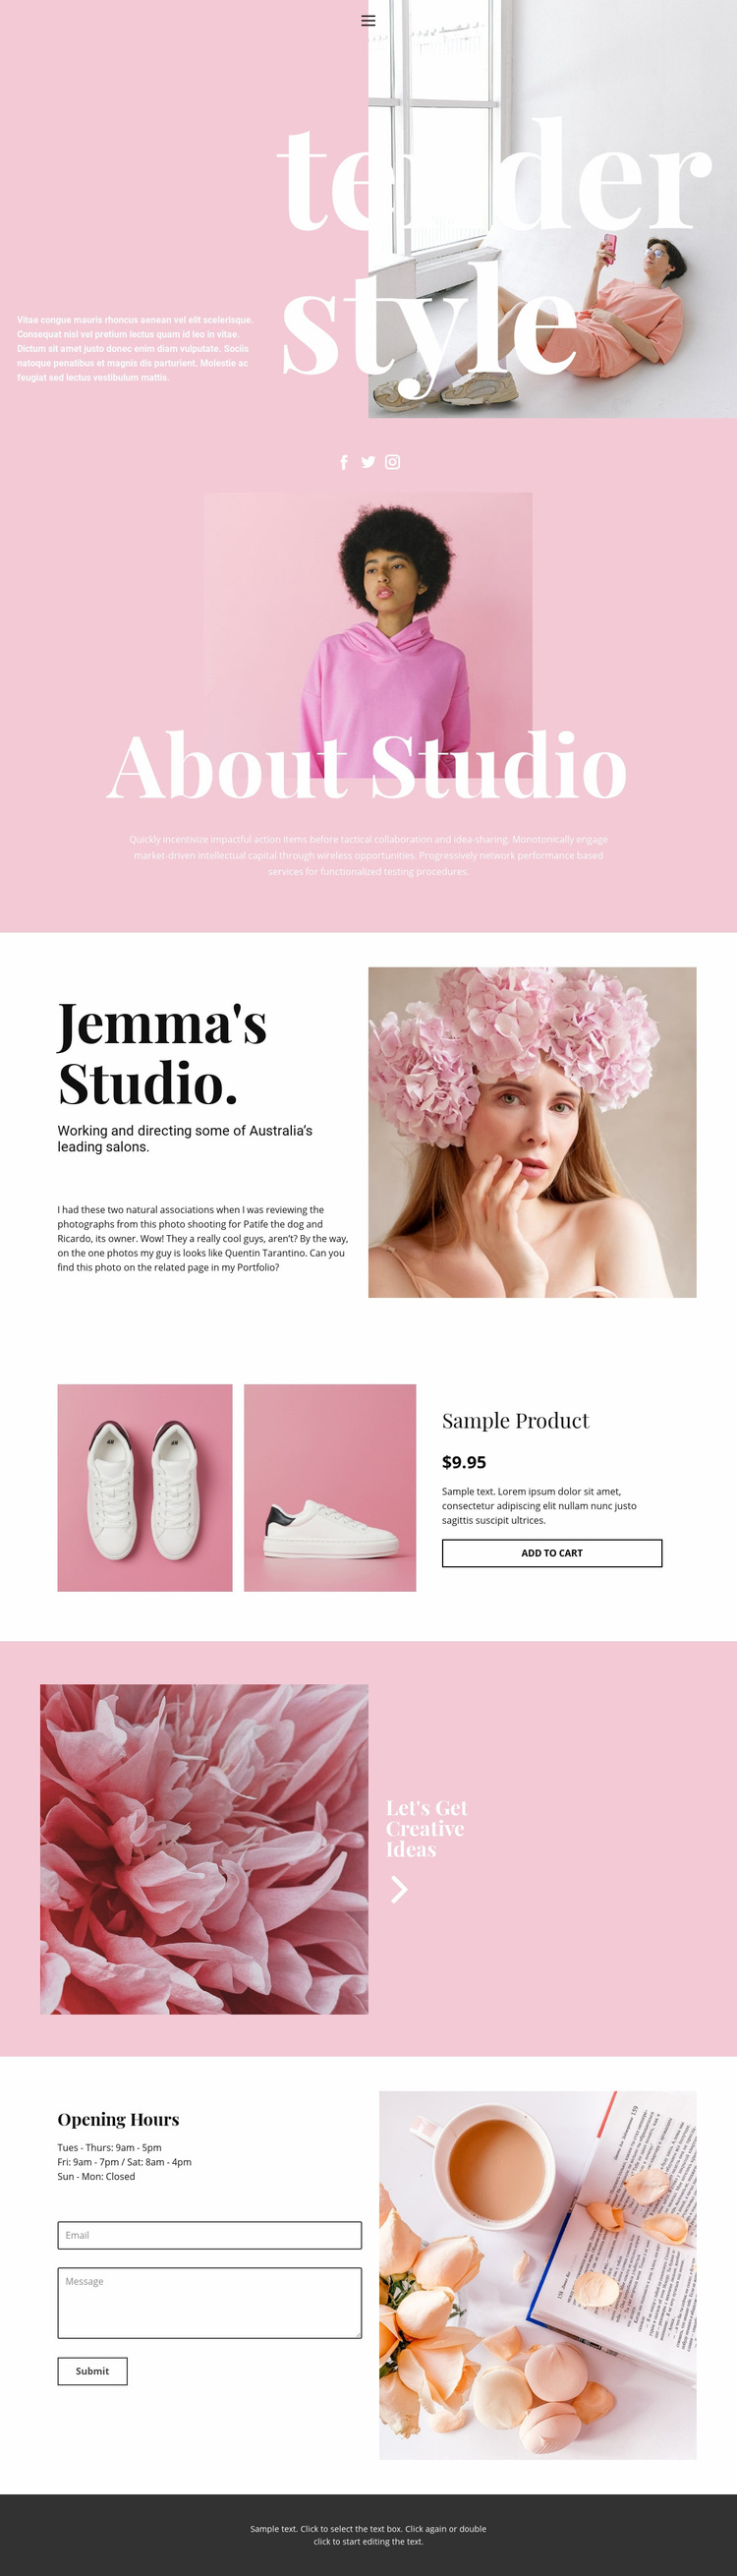 Fashion news Web Page Designer